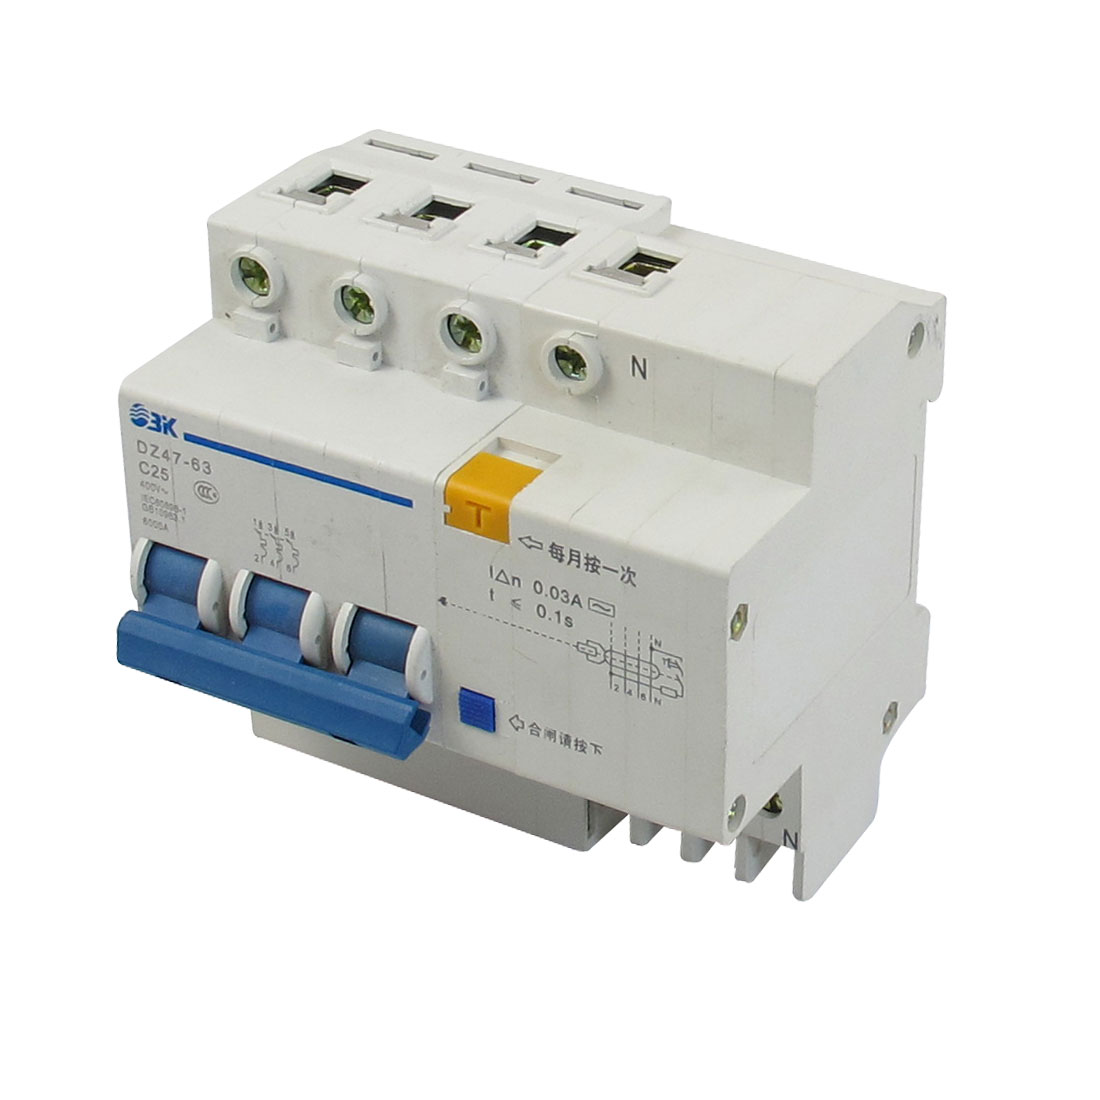 6000A Breaking Capacity DIN Rail 3P+N Earth Leakage Circuit Breaker AC 400V 25A